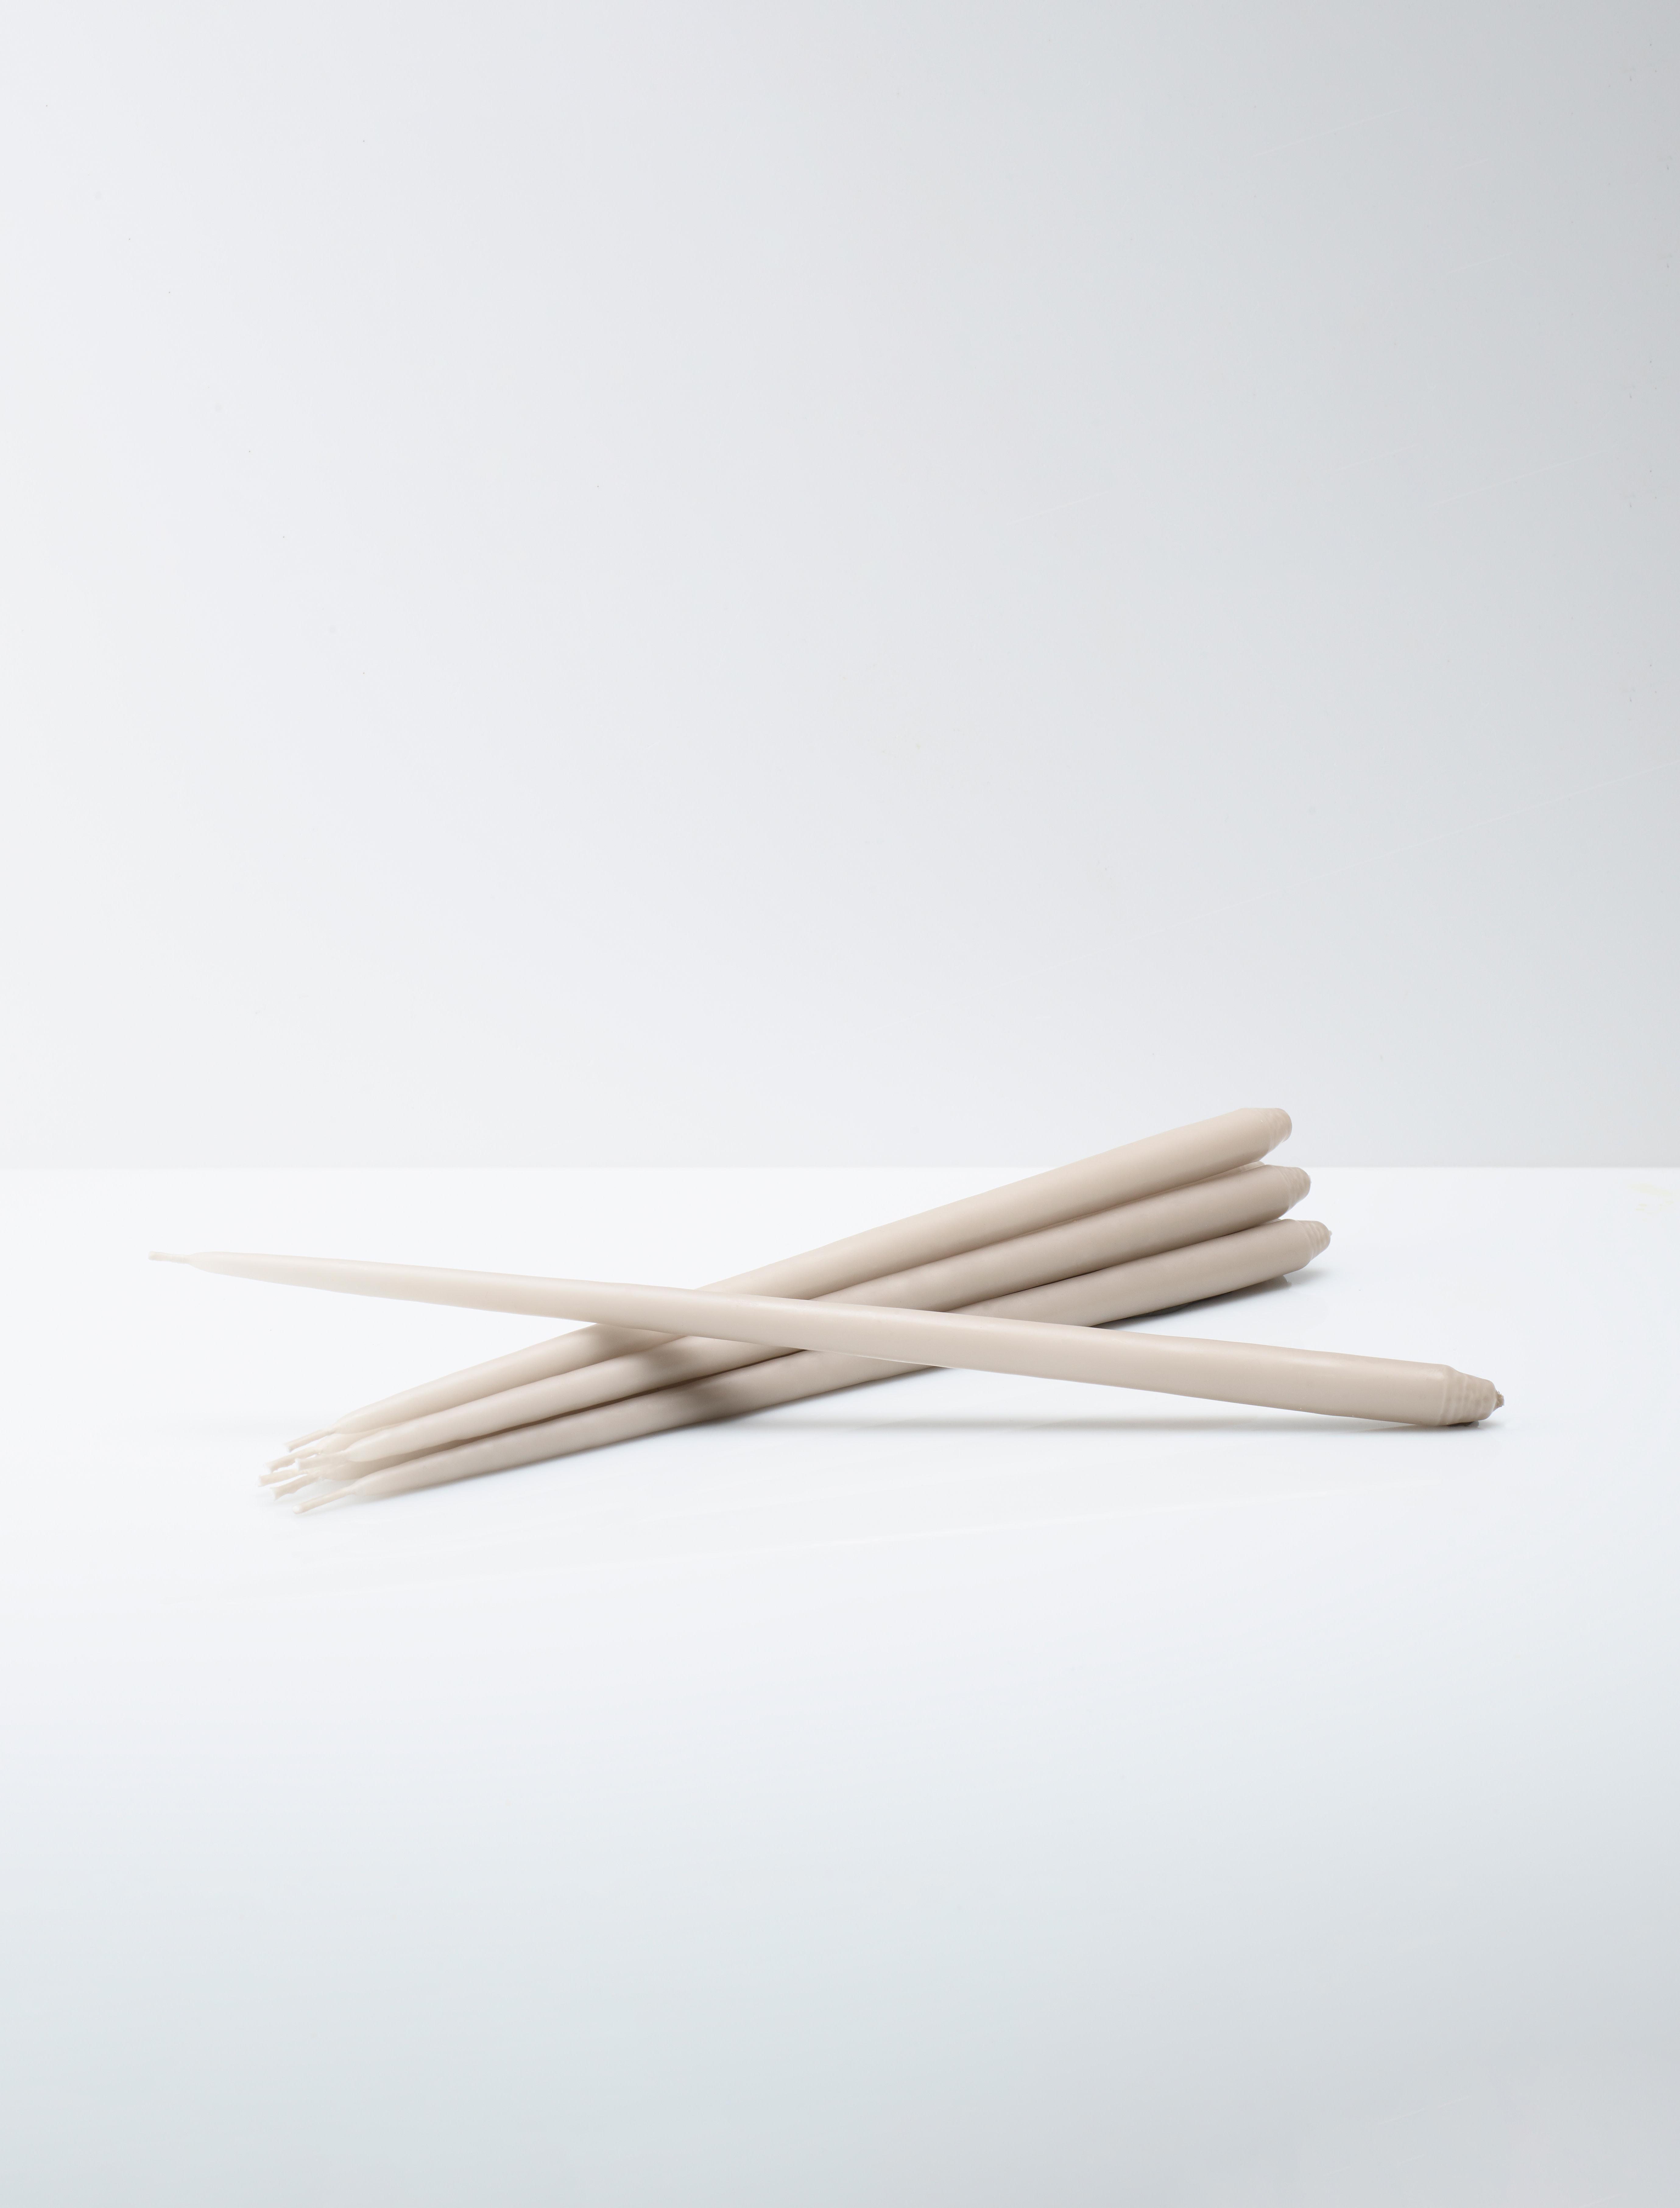 STOFF CANDLES BY ESTER & ERIK SAND